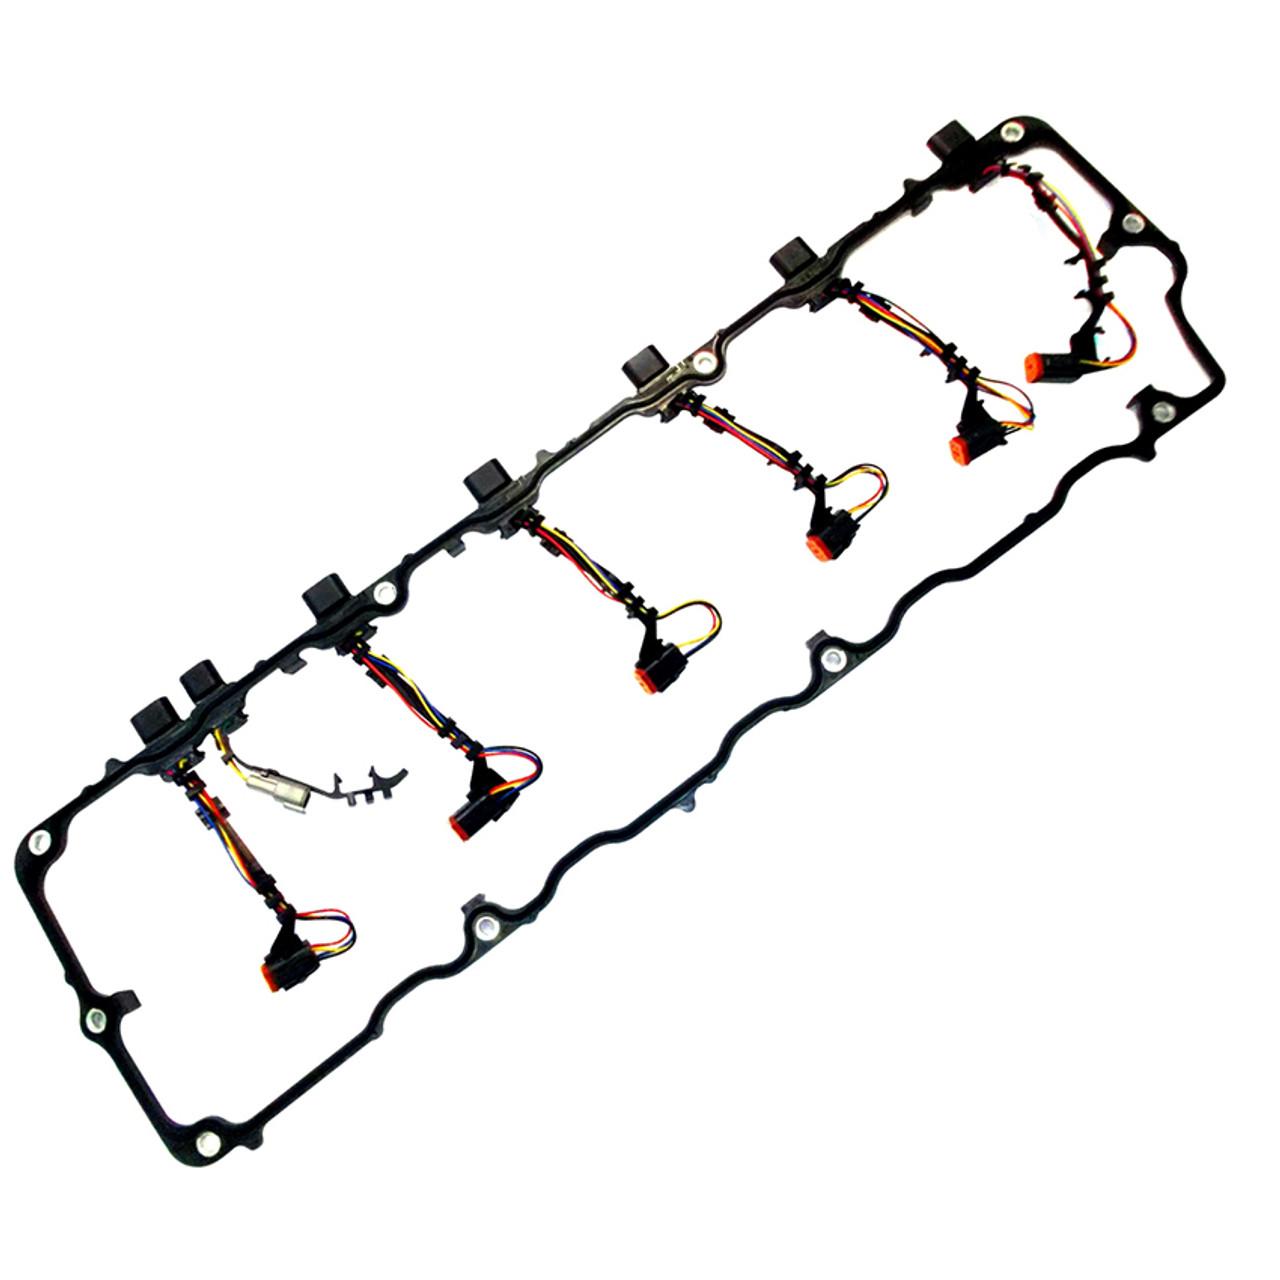 Navistar Dt466e Injector Harness Also Dt466e Injector Wiring